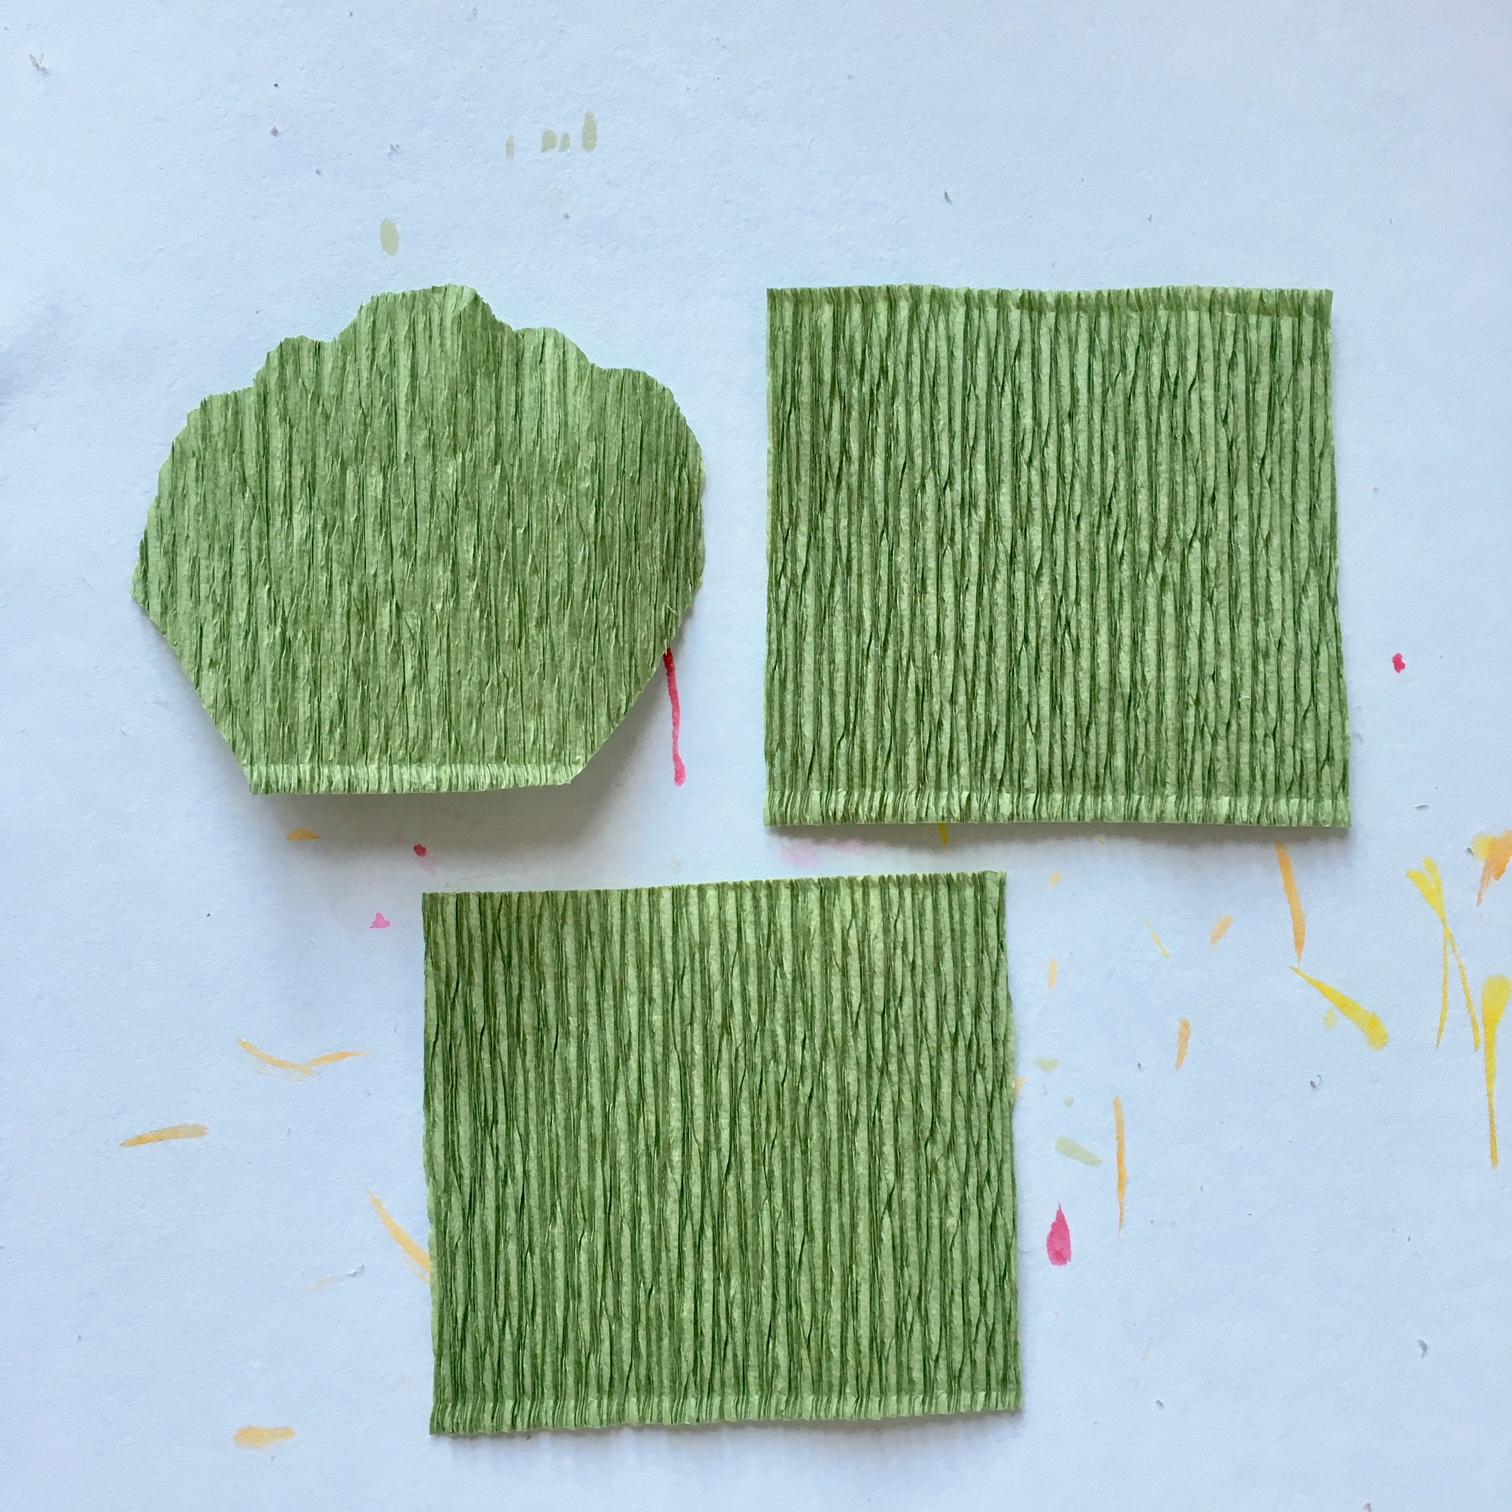 making pelargonium leaves from green crepe paper